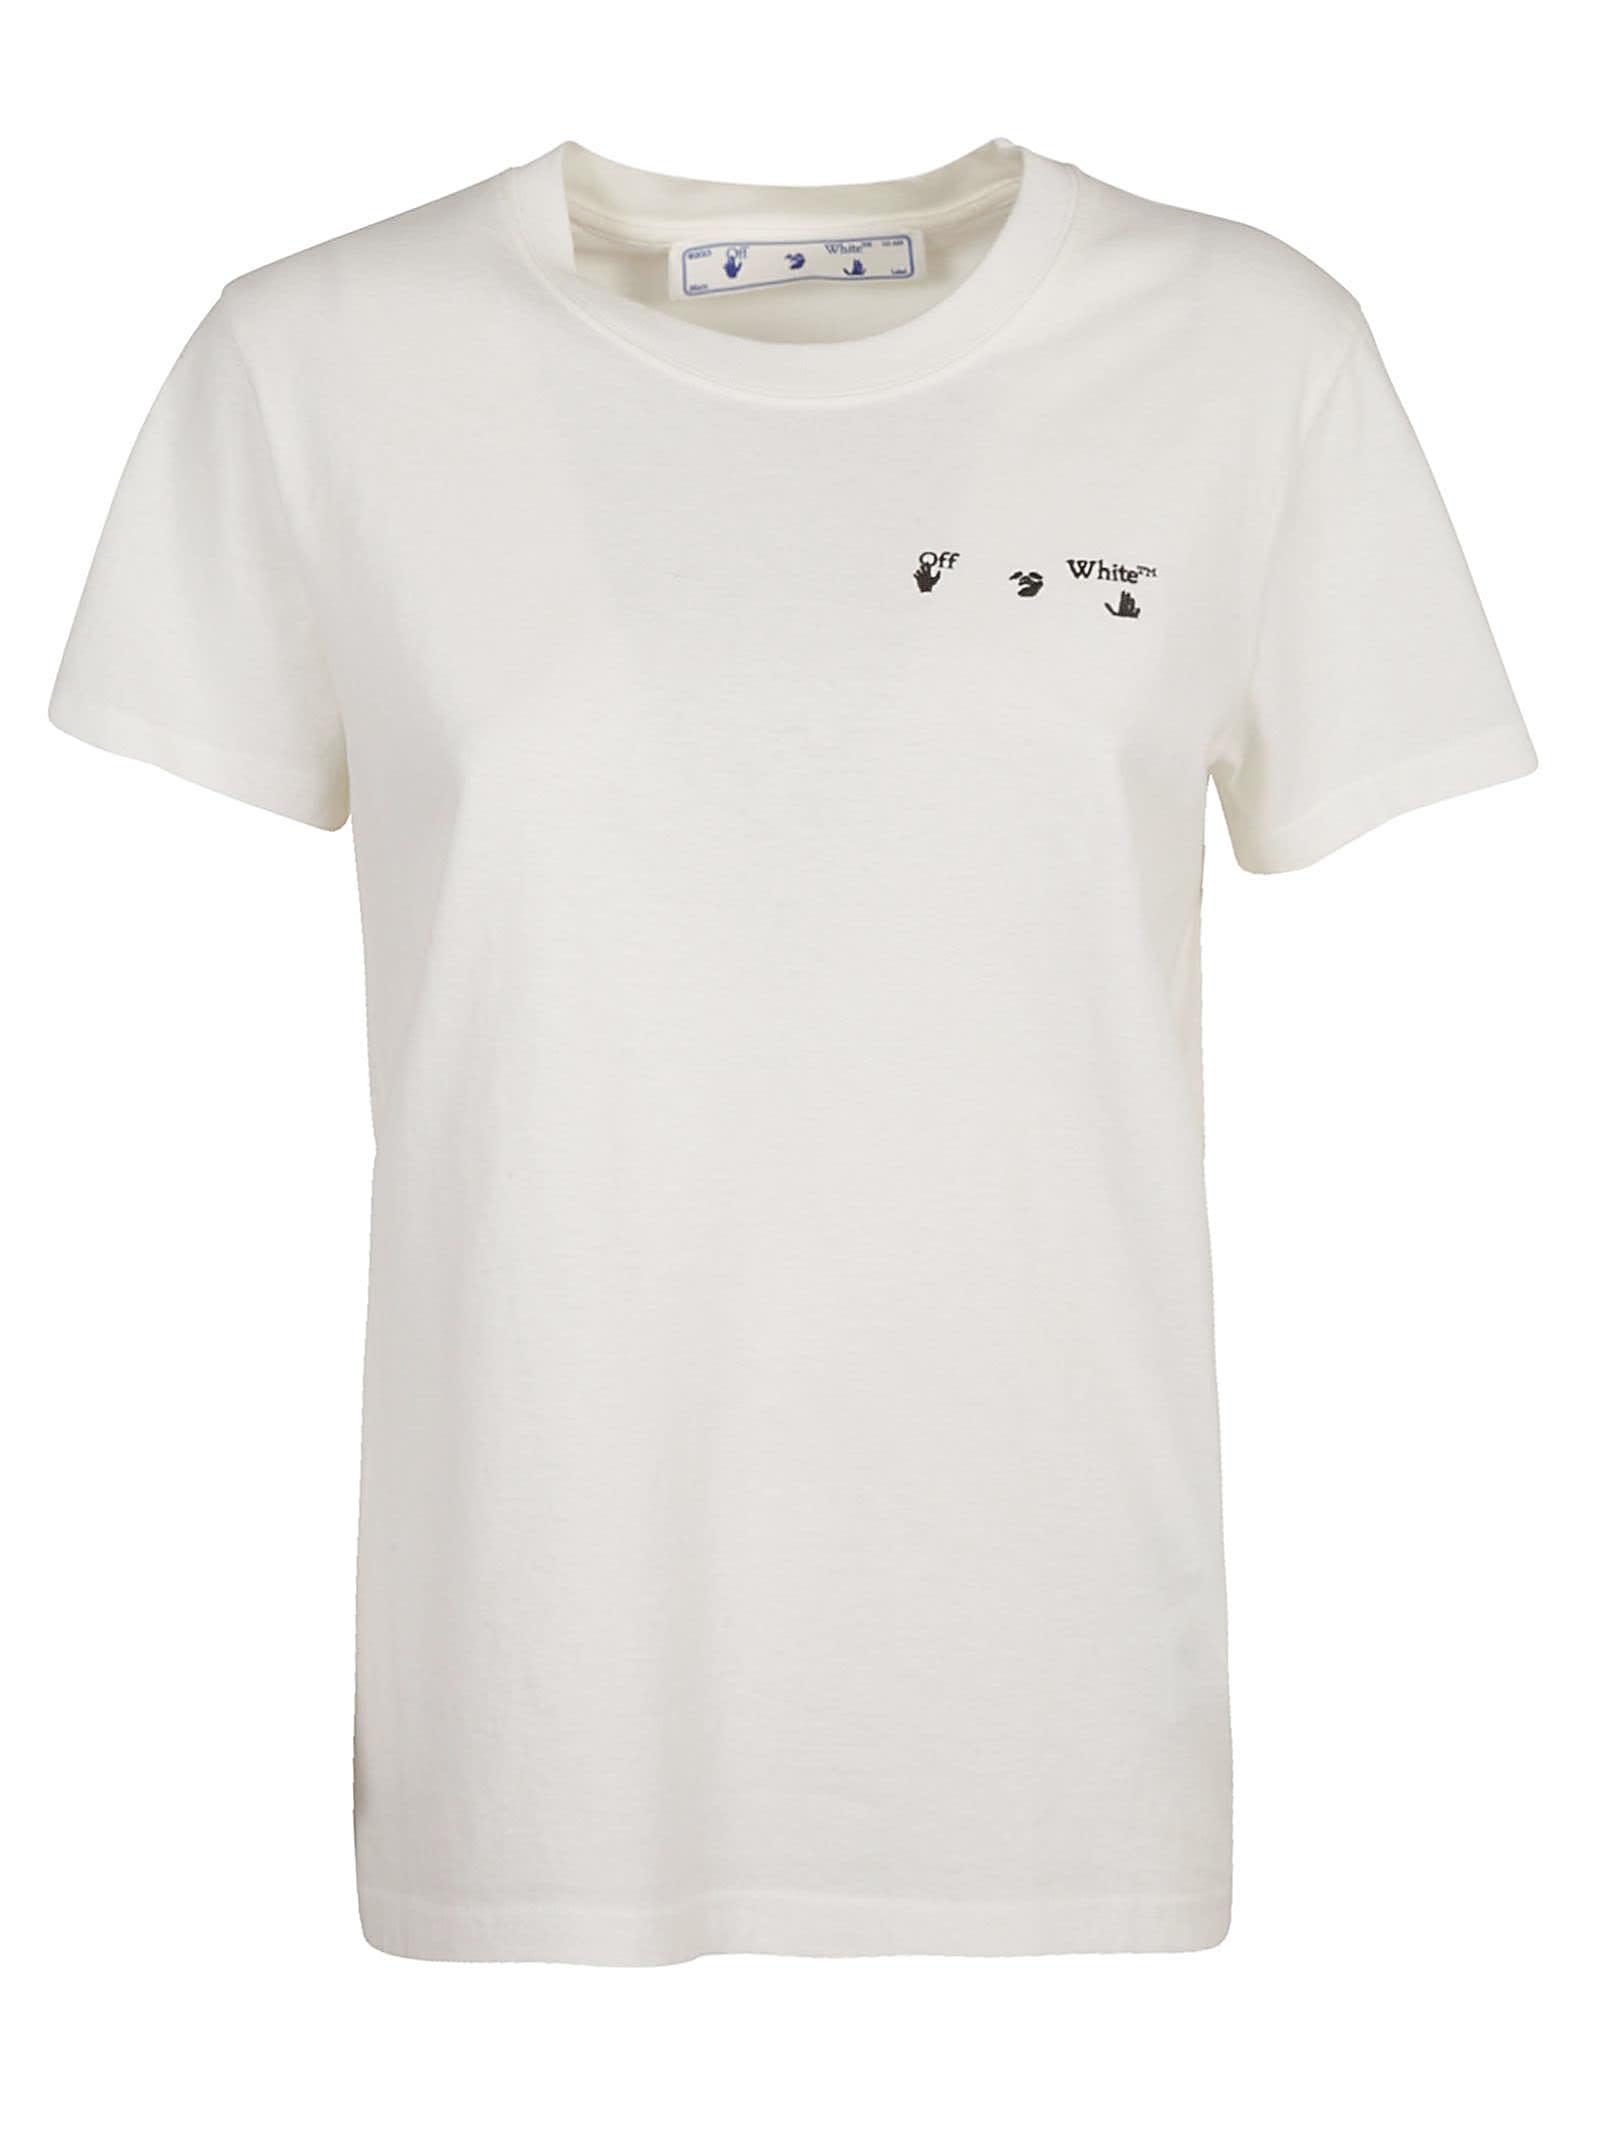 Off-White Casual Arrow Liquid Melt T-shirt